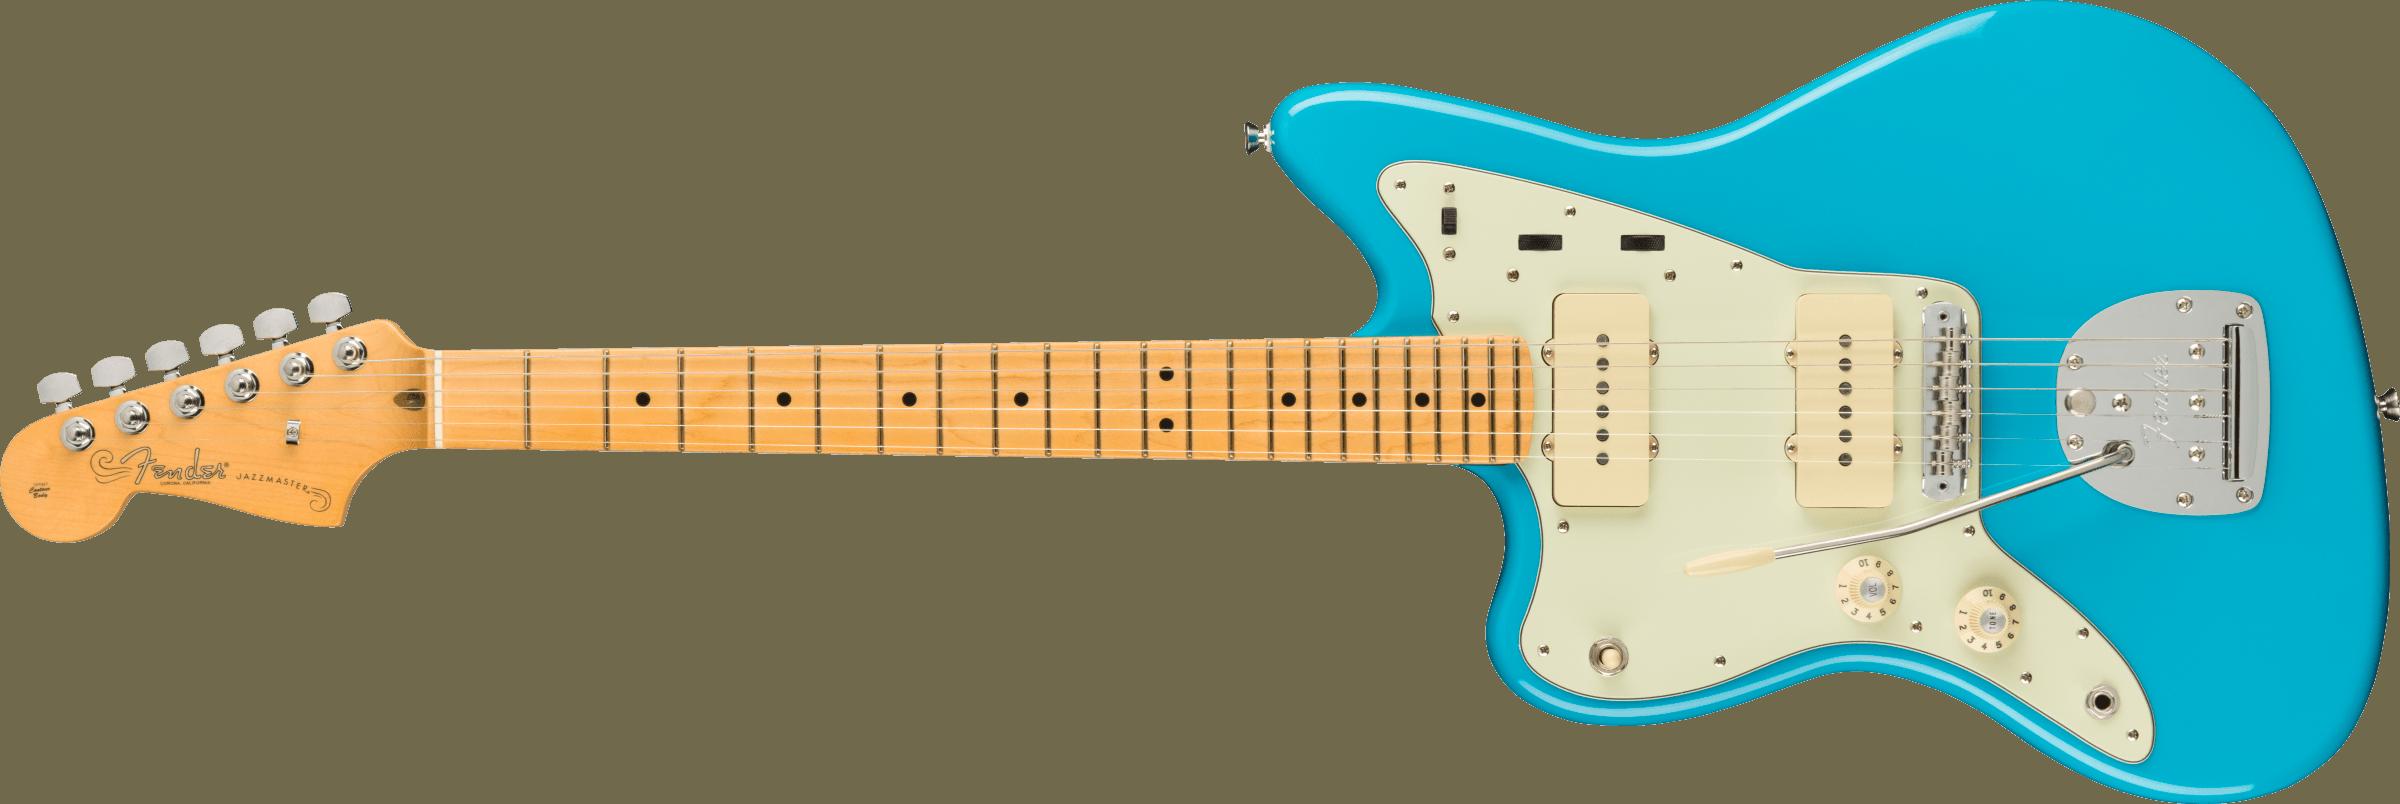 FENDER-American-Professional-II-Jazzmaster-Left-Hand-Maple-Fingerboard-Miami-Blue-sku-571005277